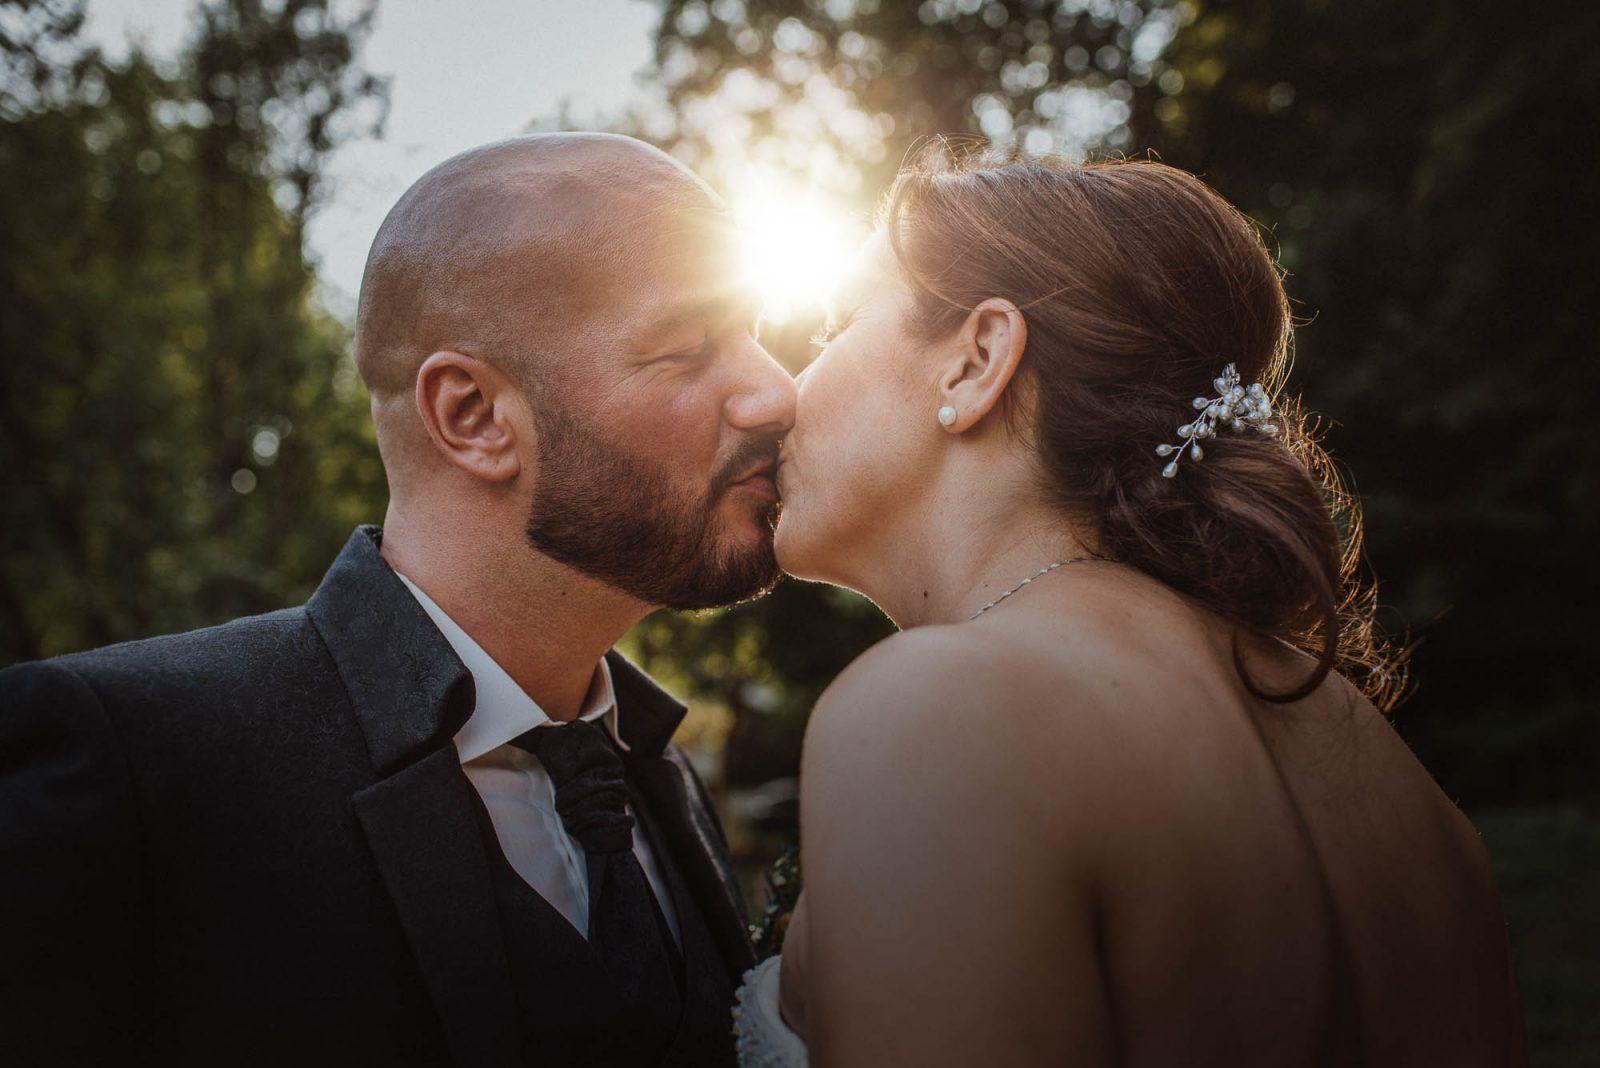 Hochzeitsfotograf Siegburg Fotograf Sven Palm